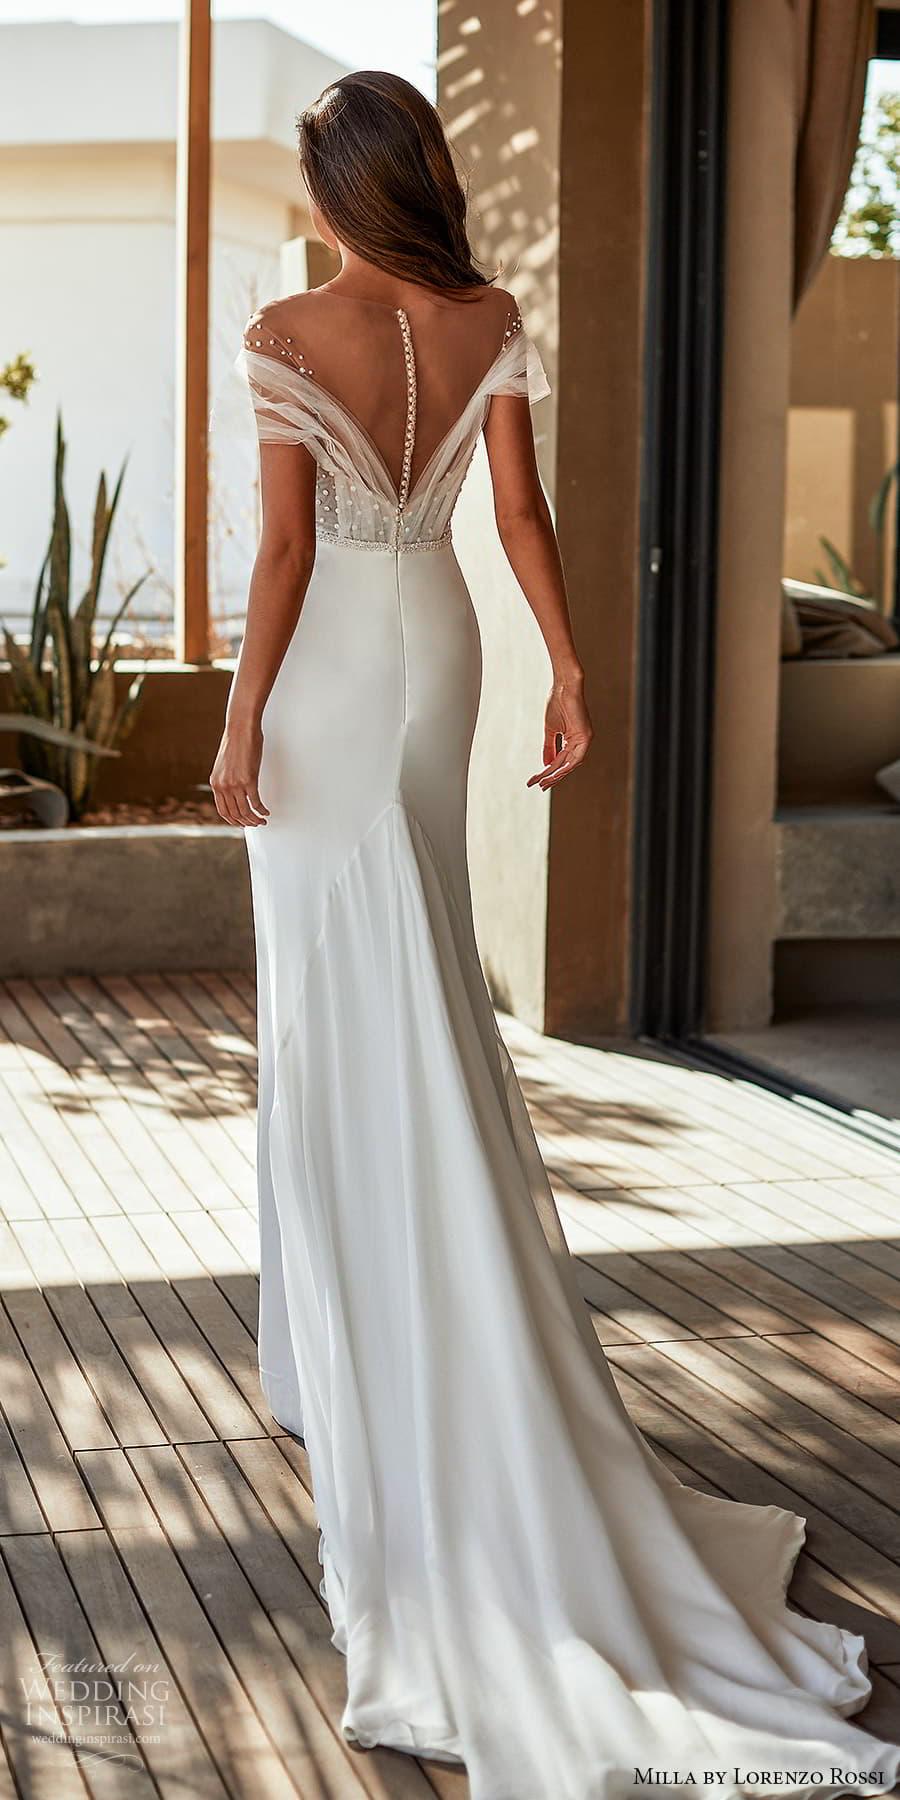 milla lorenzo rossi 2022 bridal off shoulder short sleeves sweetheart neckline embellished bodice clean skirt sheath wedding dress chapel train (3) bv